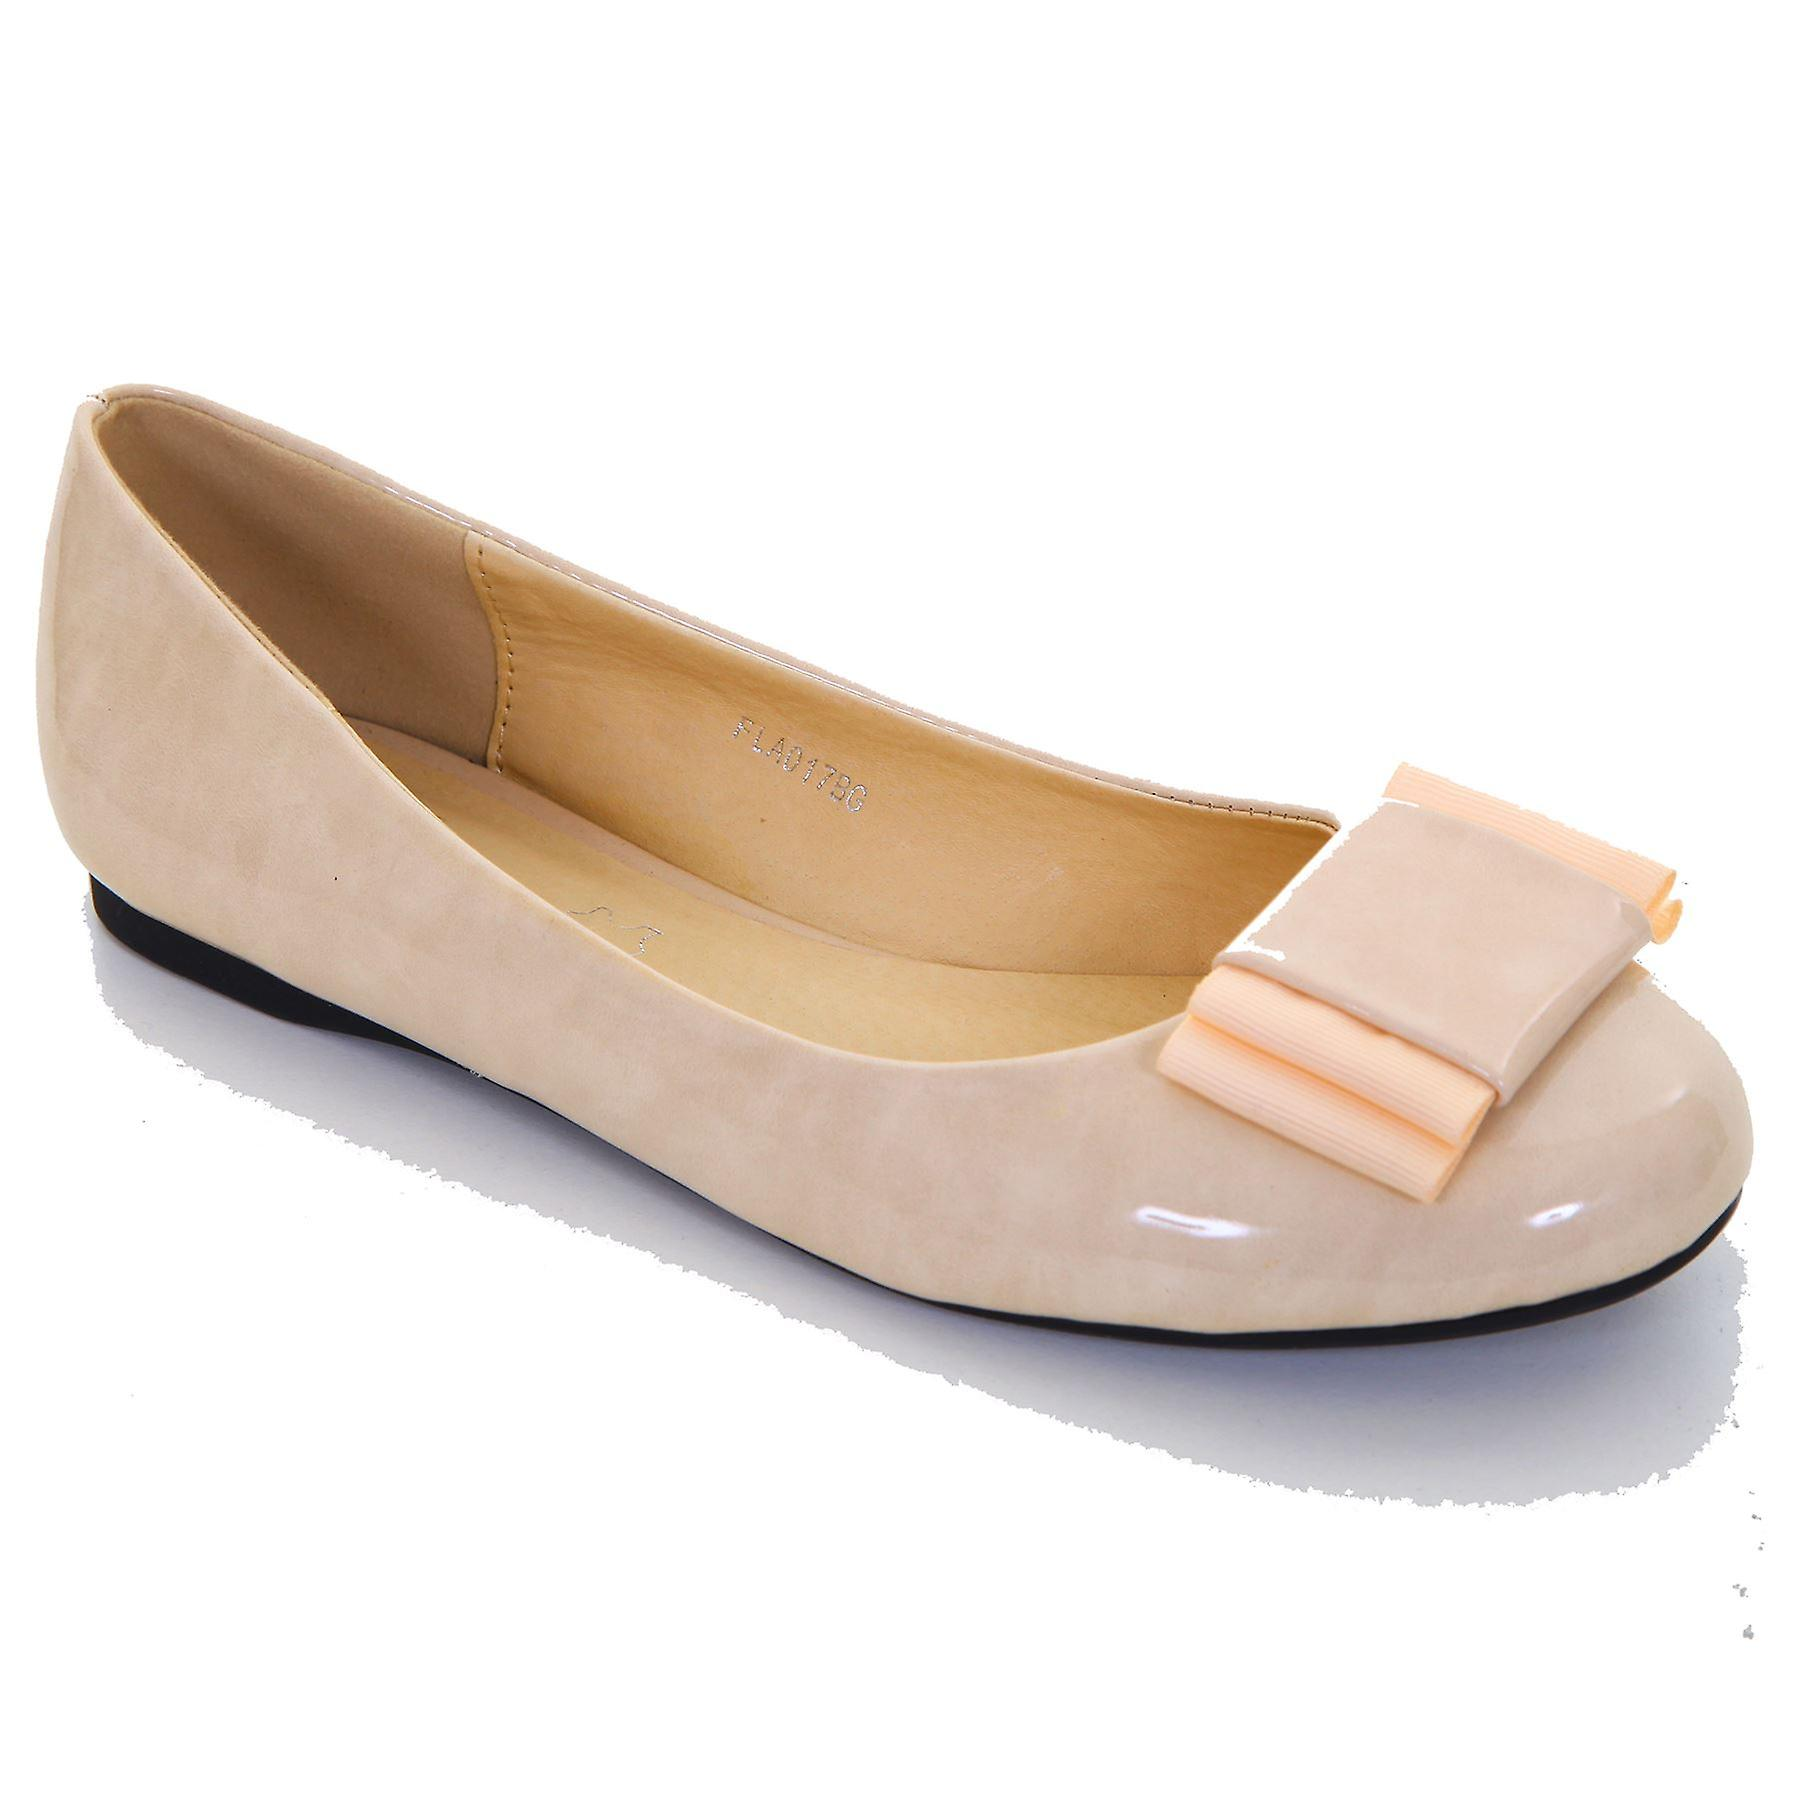 Hyvät keula aksentti patentti Smart Casual Comfort naisten Flats pumput kengät